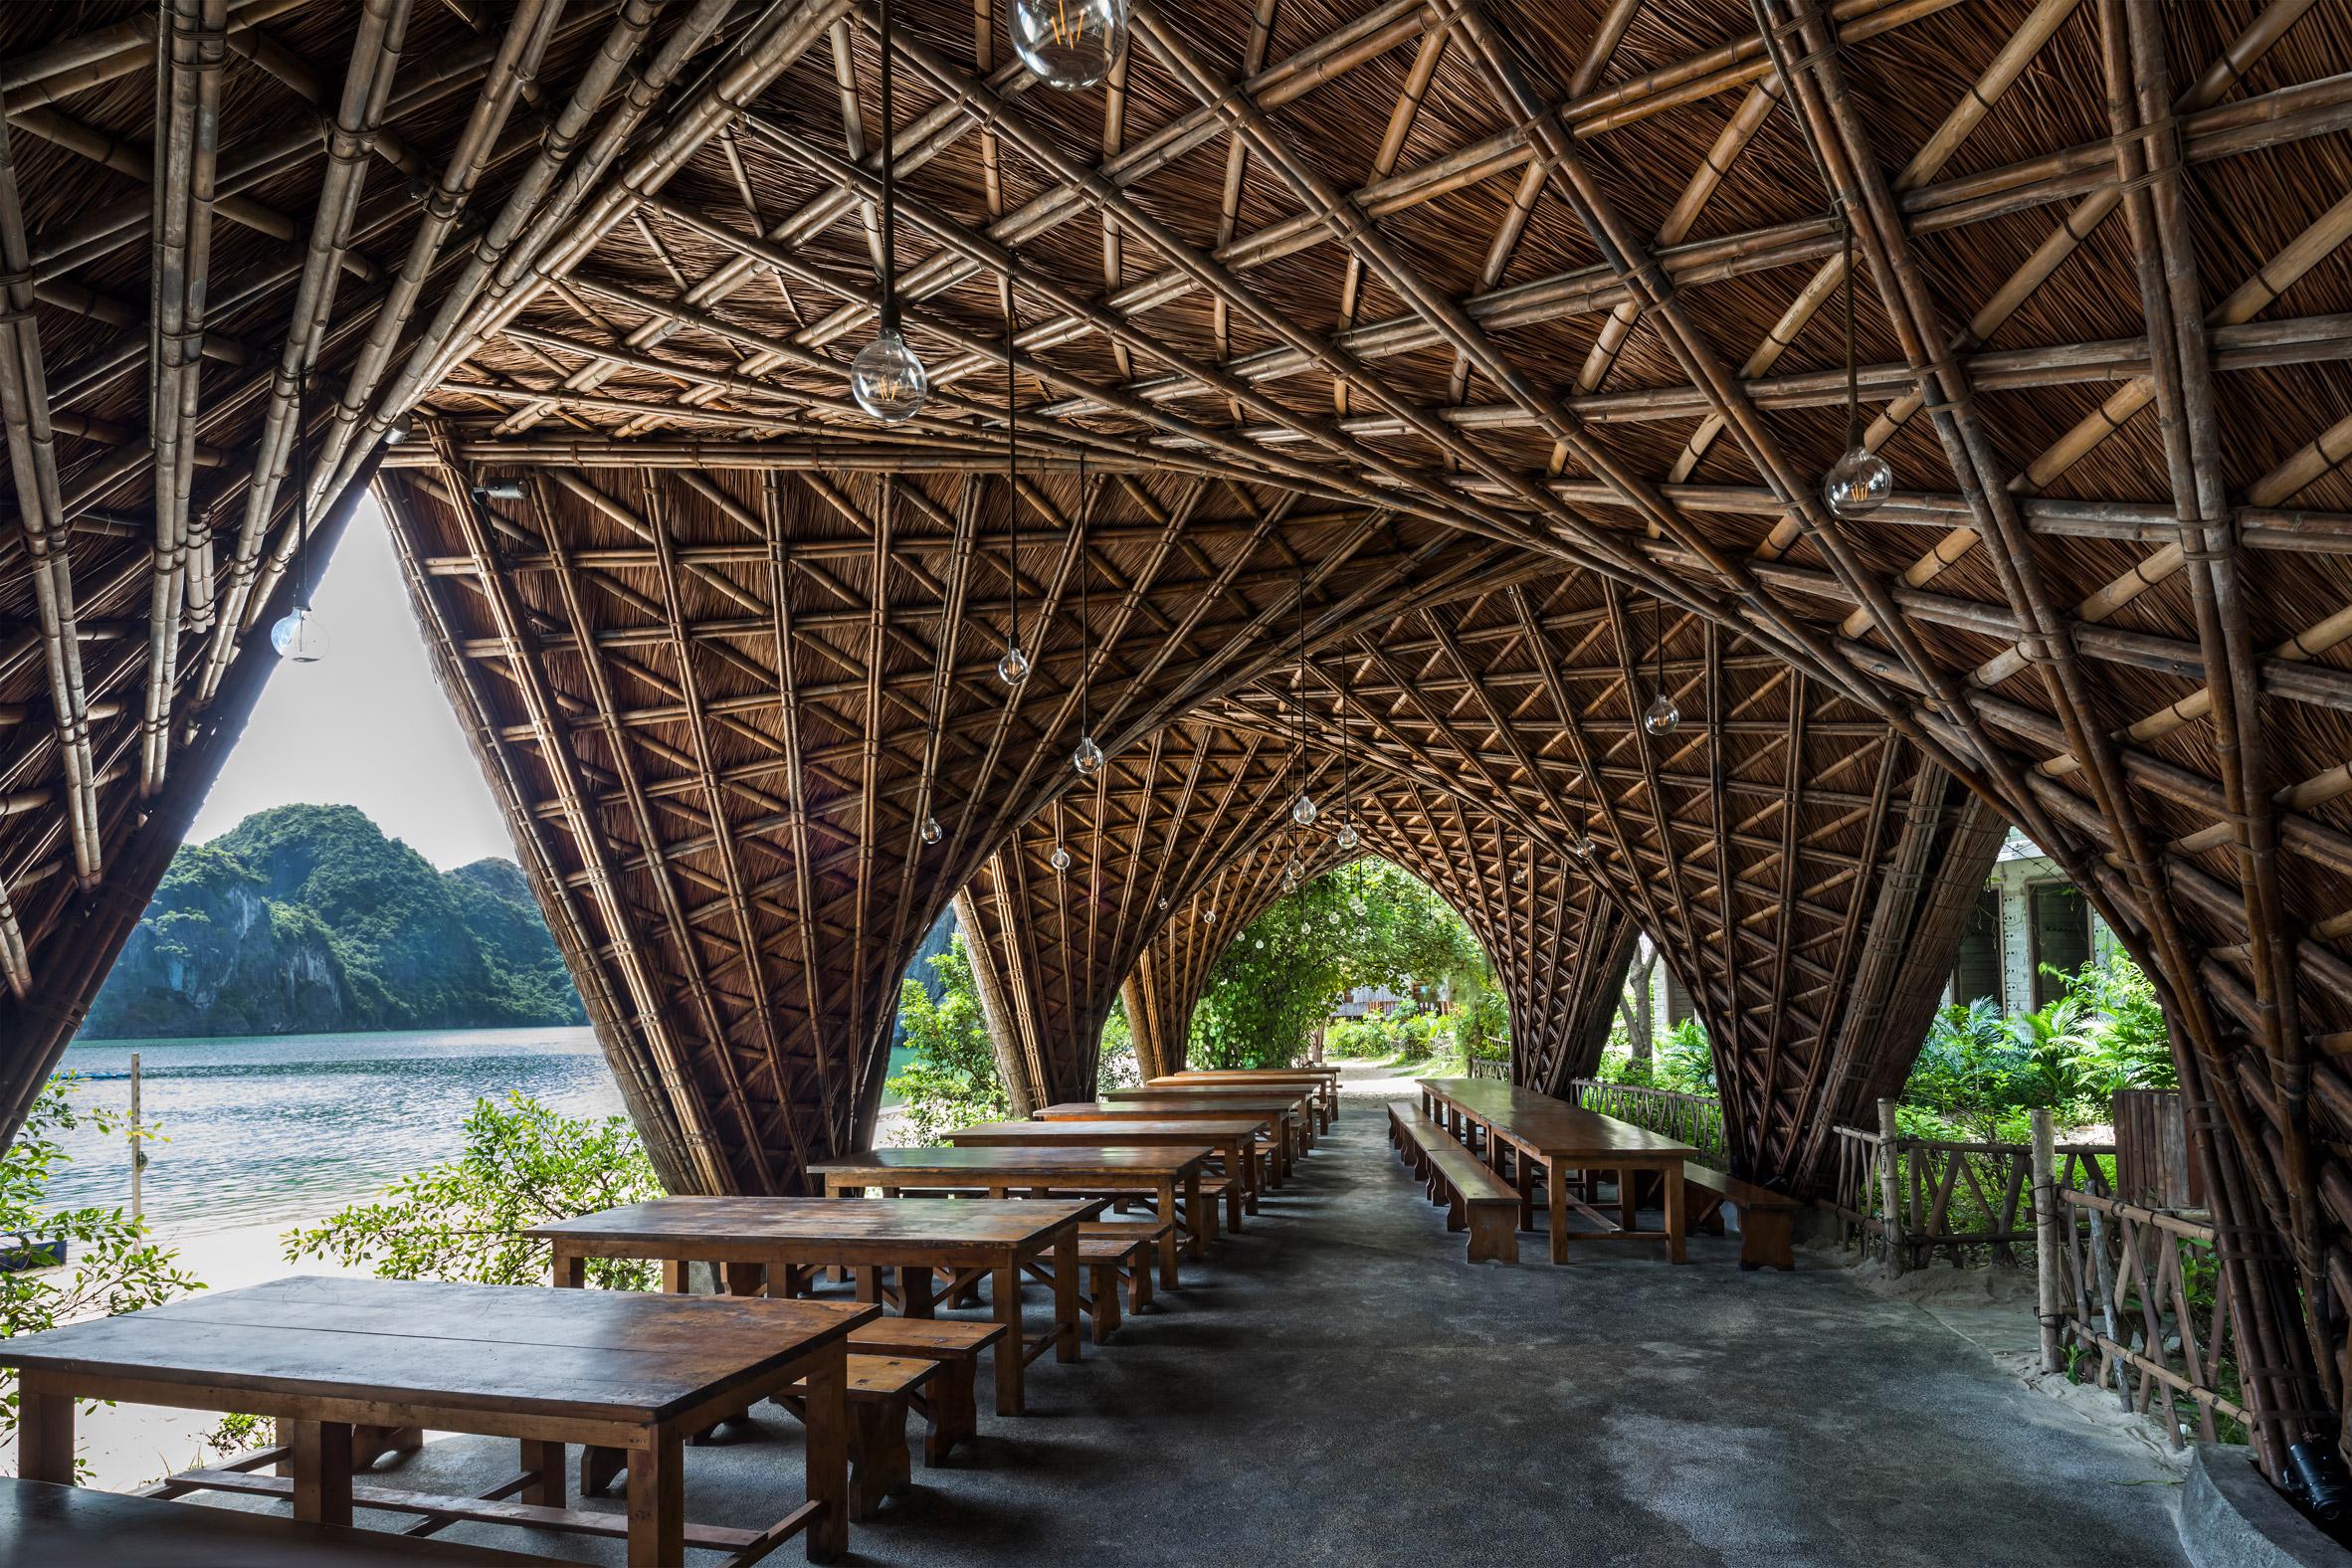 Thiết kế Resort biển 14